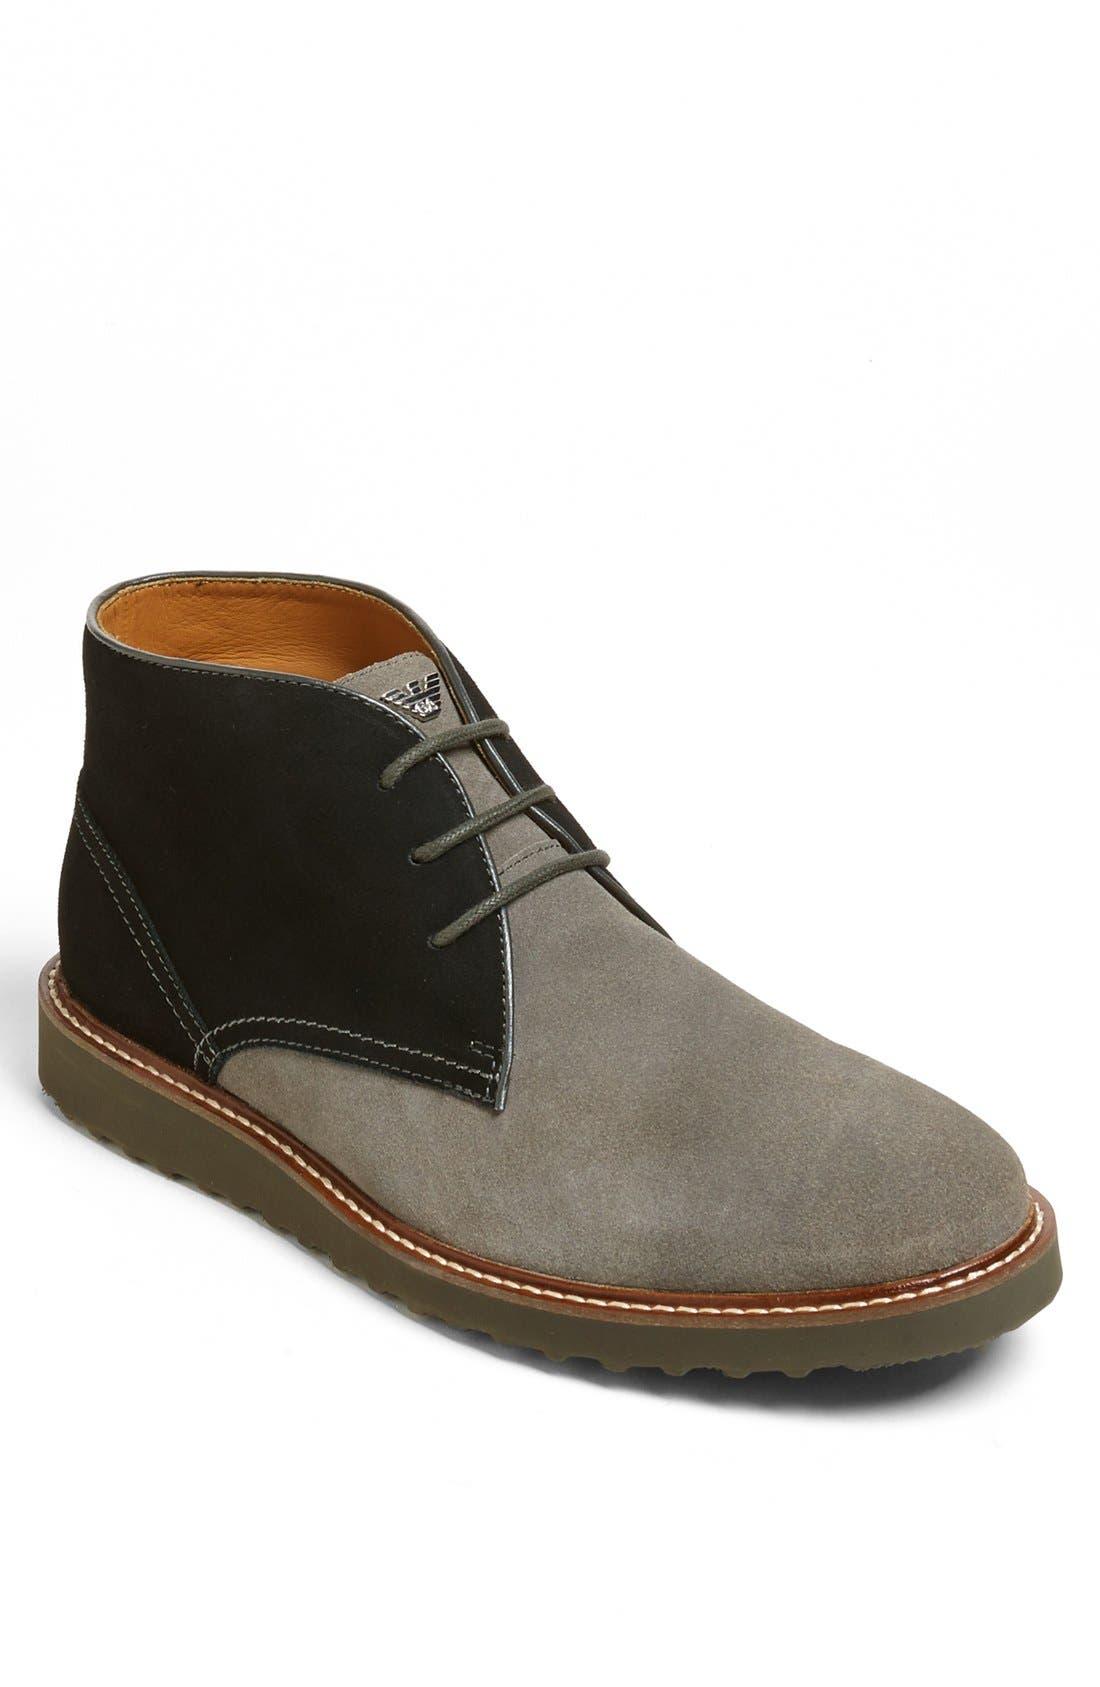 Main Image - Armani Jeans 'Desert' Chukka Boot (Men)